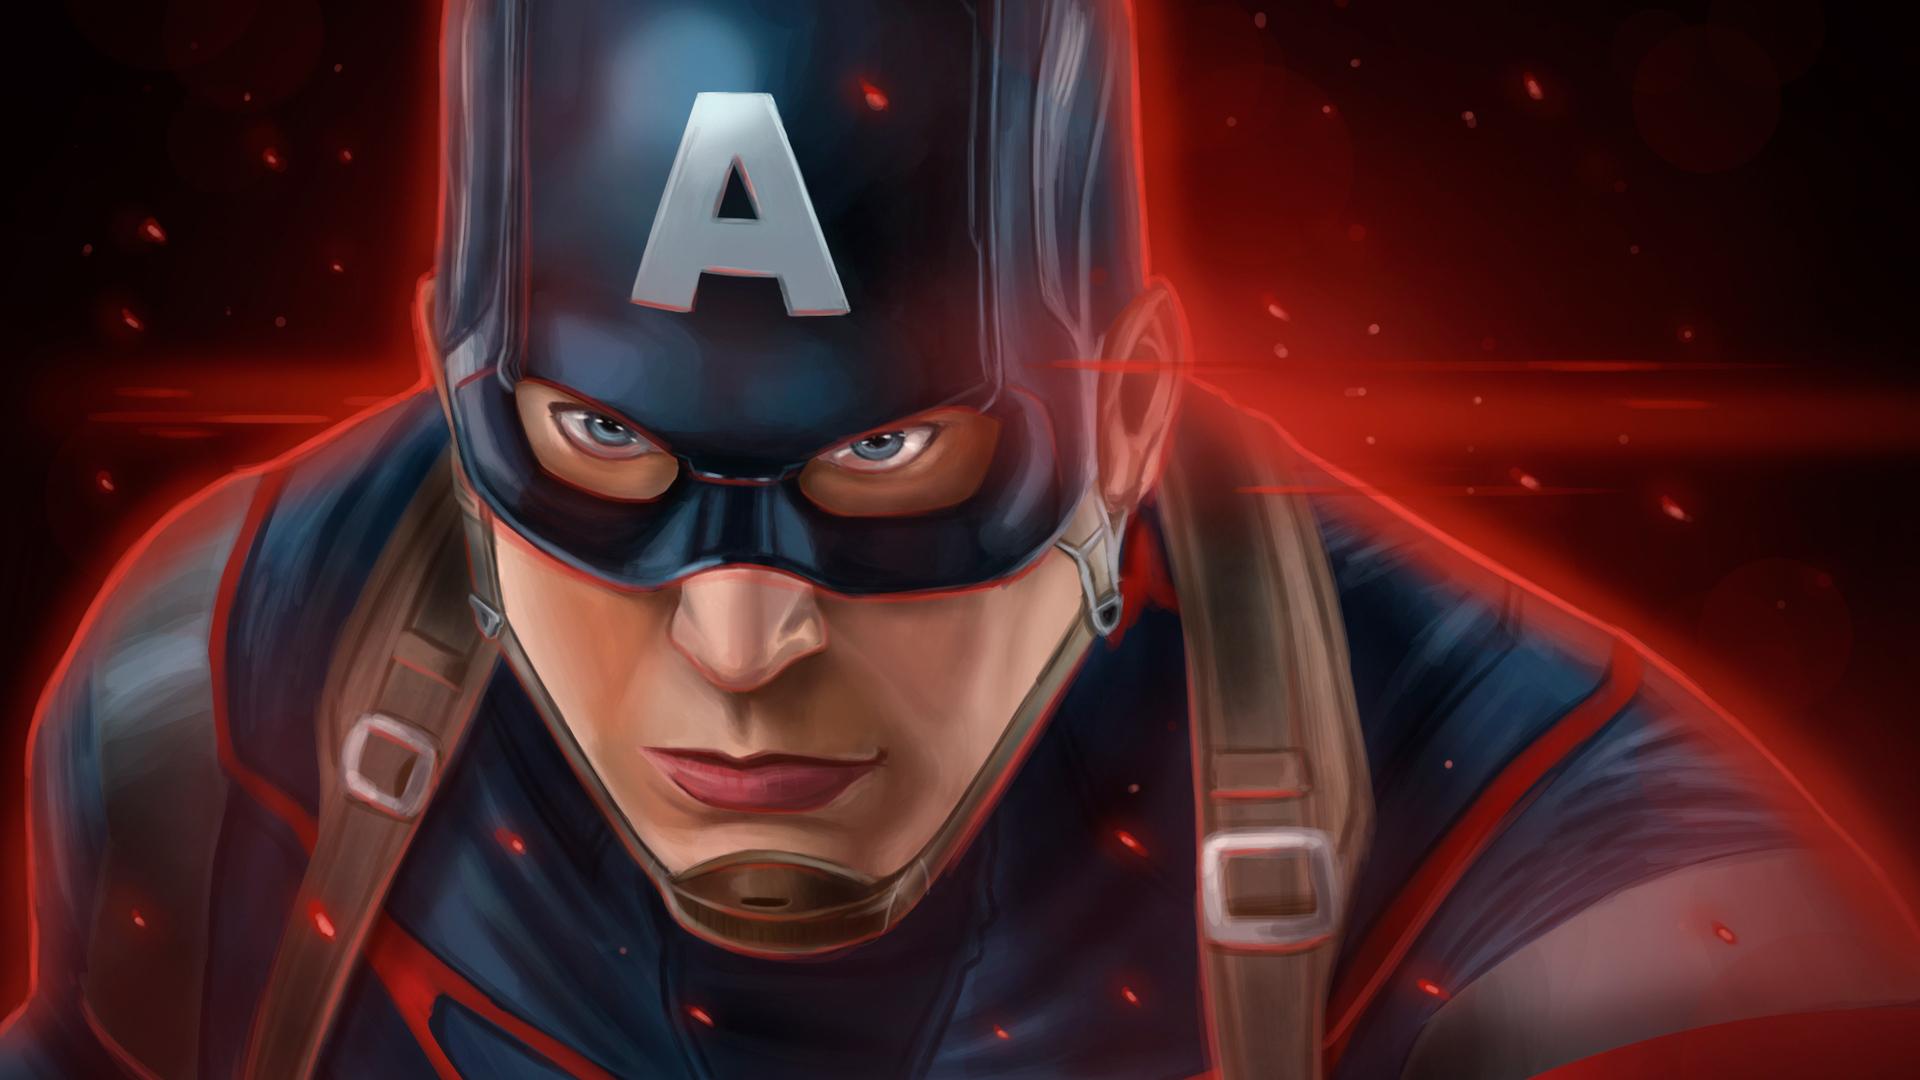 1920x1080 Captain America Latest Art Laptop Full HD 1080P ...